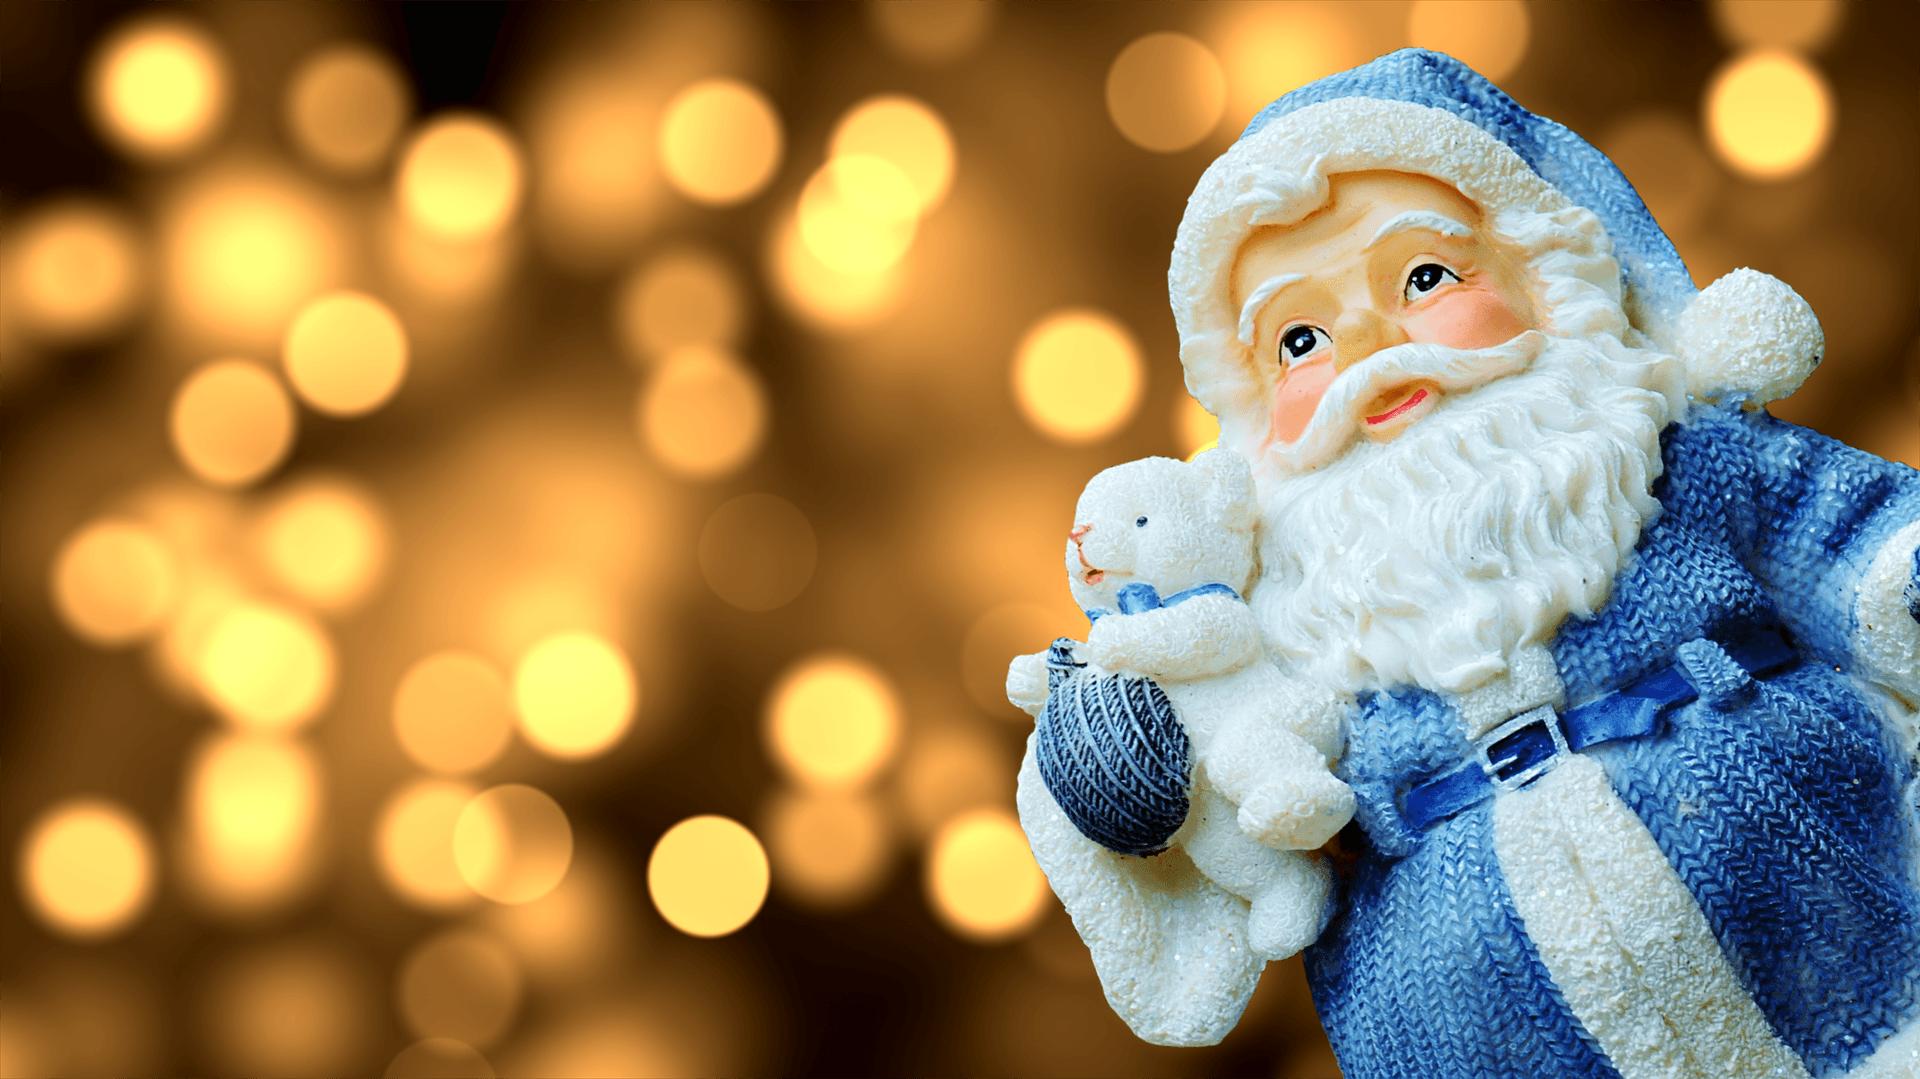 Morgen ist Nikolaus! auf blogtante.de